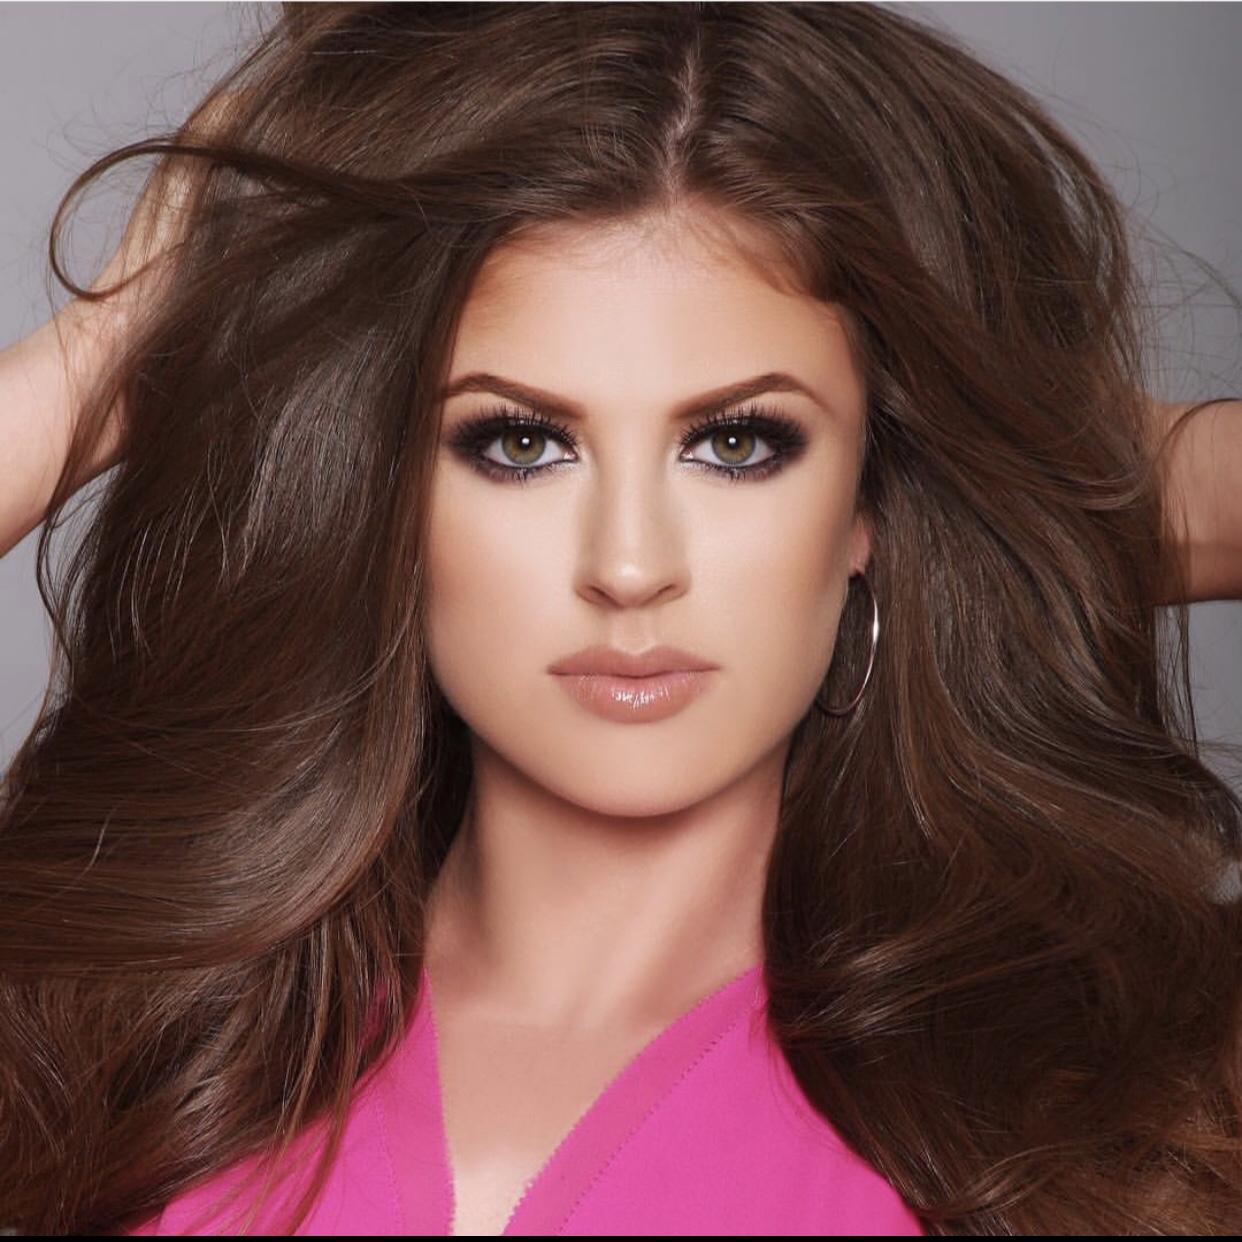 Miss Illinois USA 2019 Alex Plotz